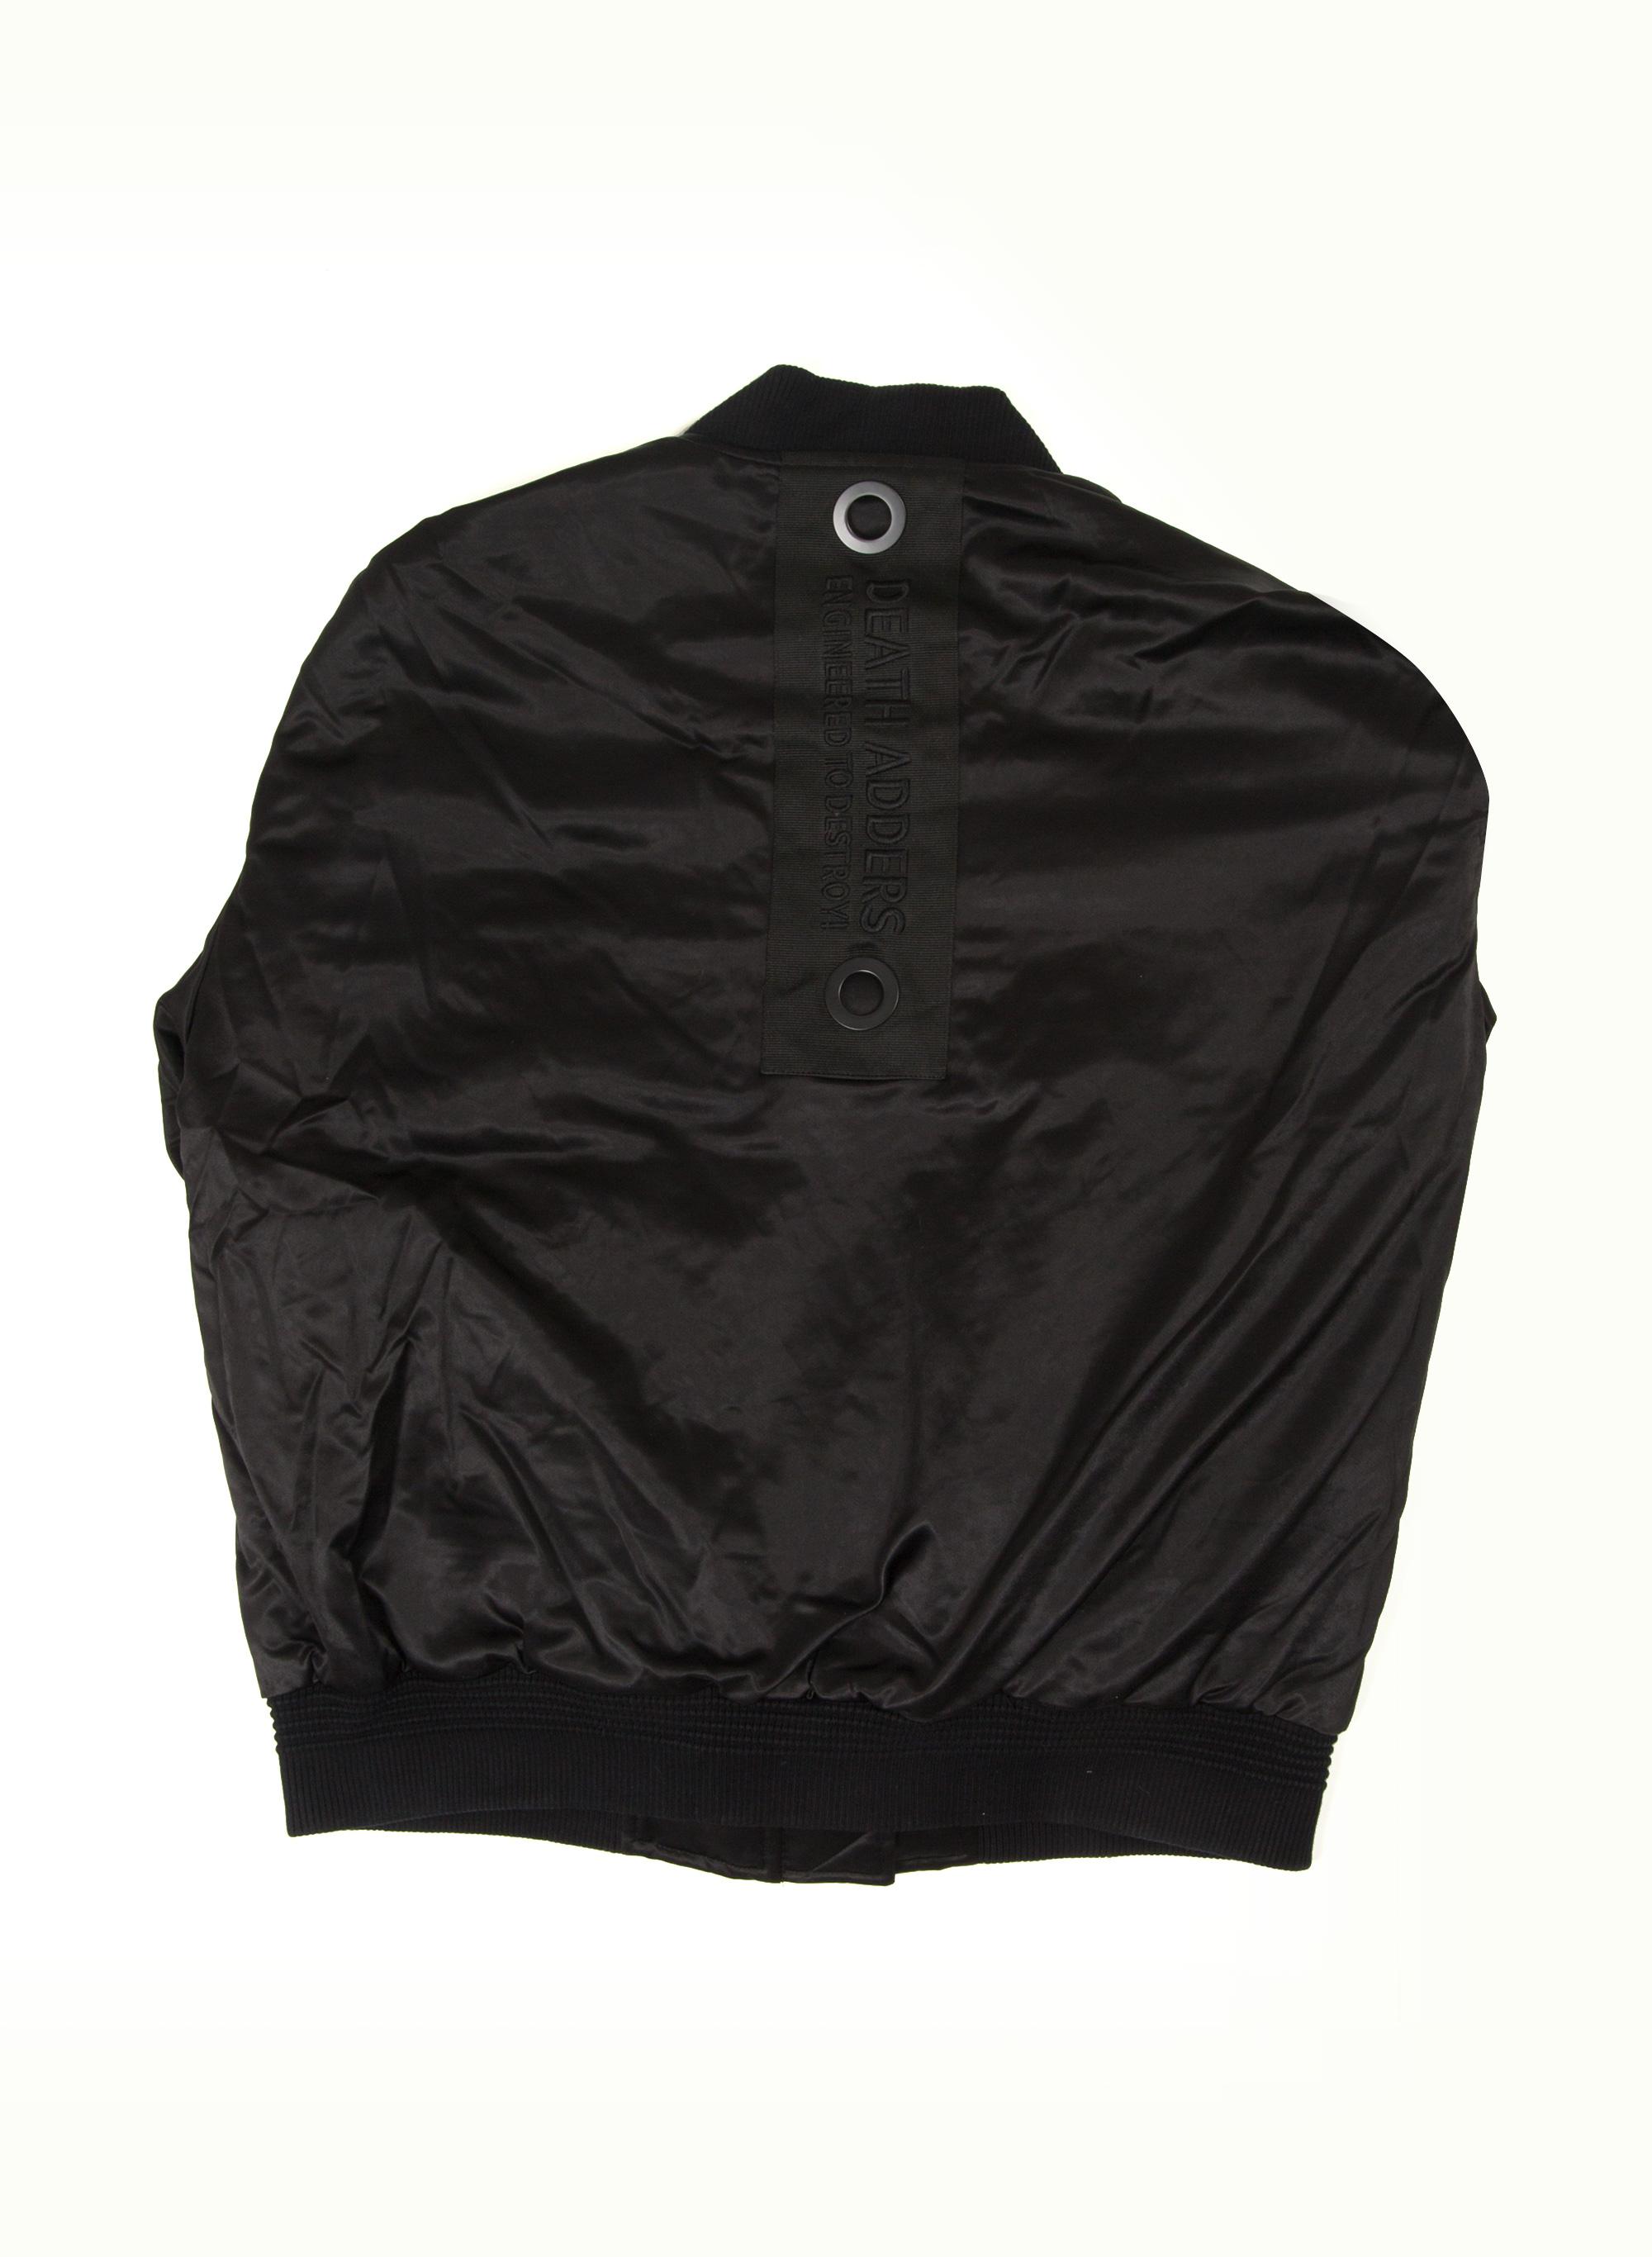 Marksman Jacket